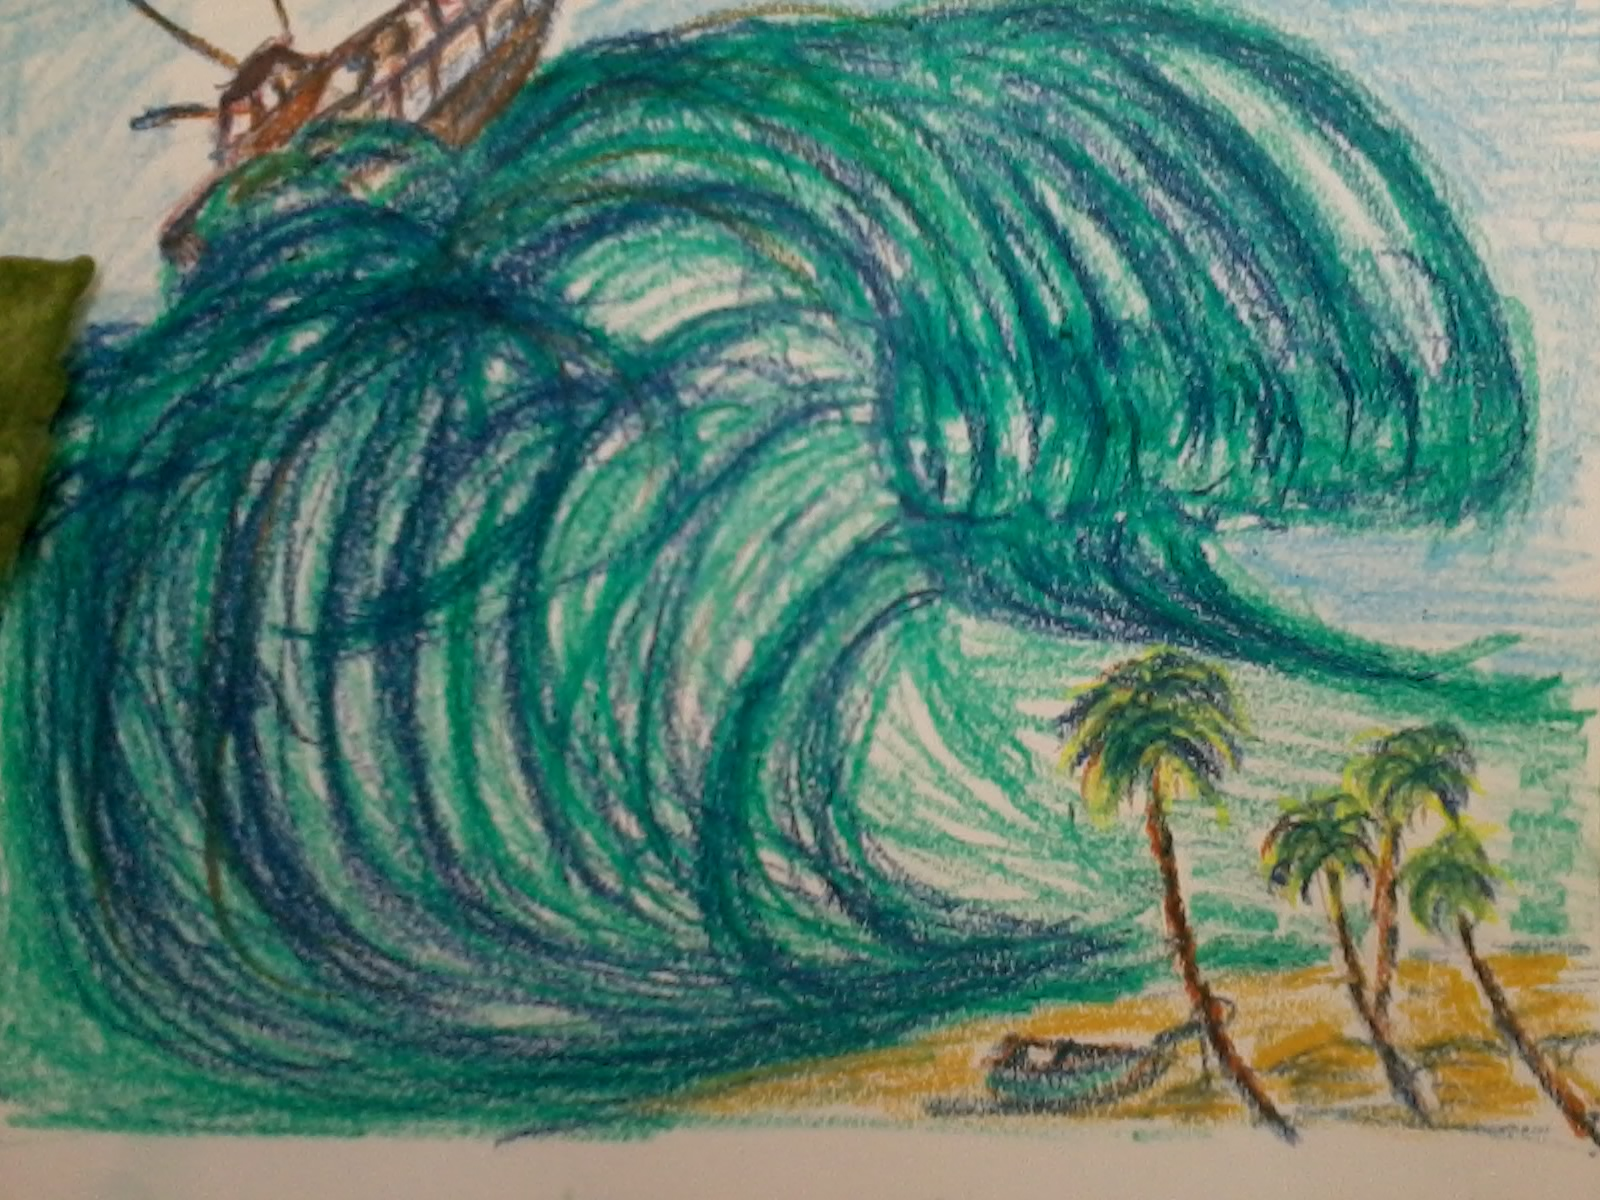 1600x1200 Chummadraw The Killer Wave Tsunami